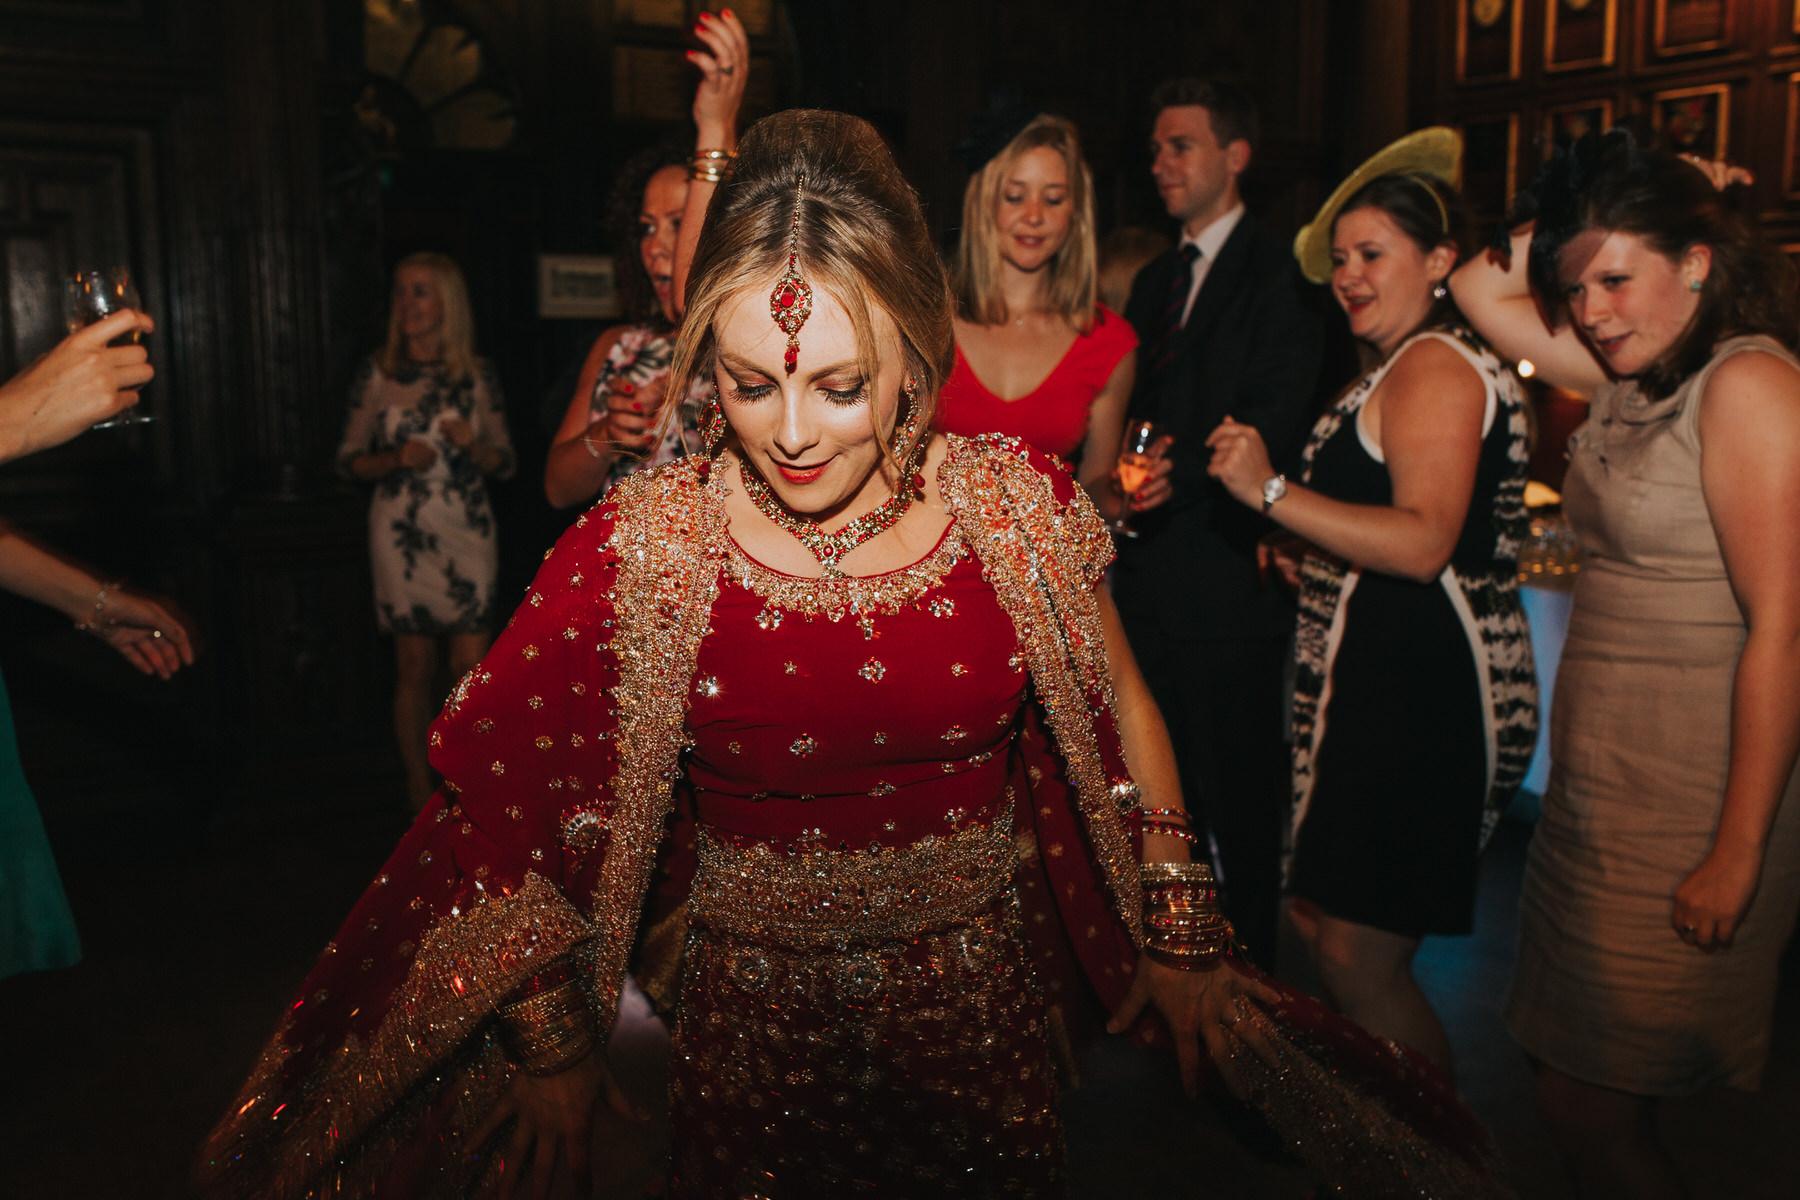 234-Anglo-Asian-wedding-bride-dancing-red-sari.jpg